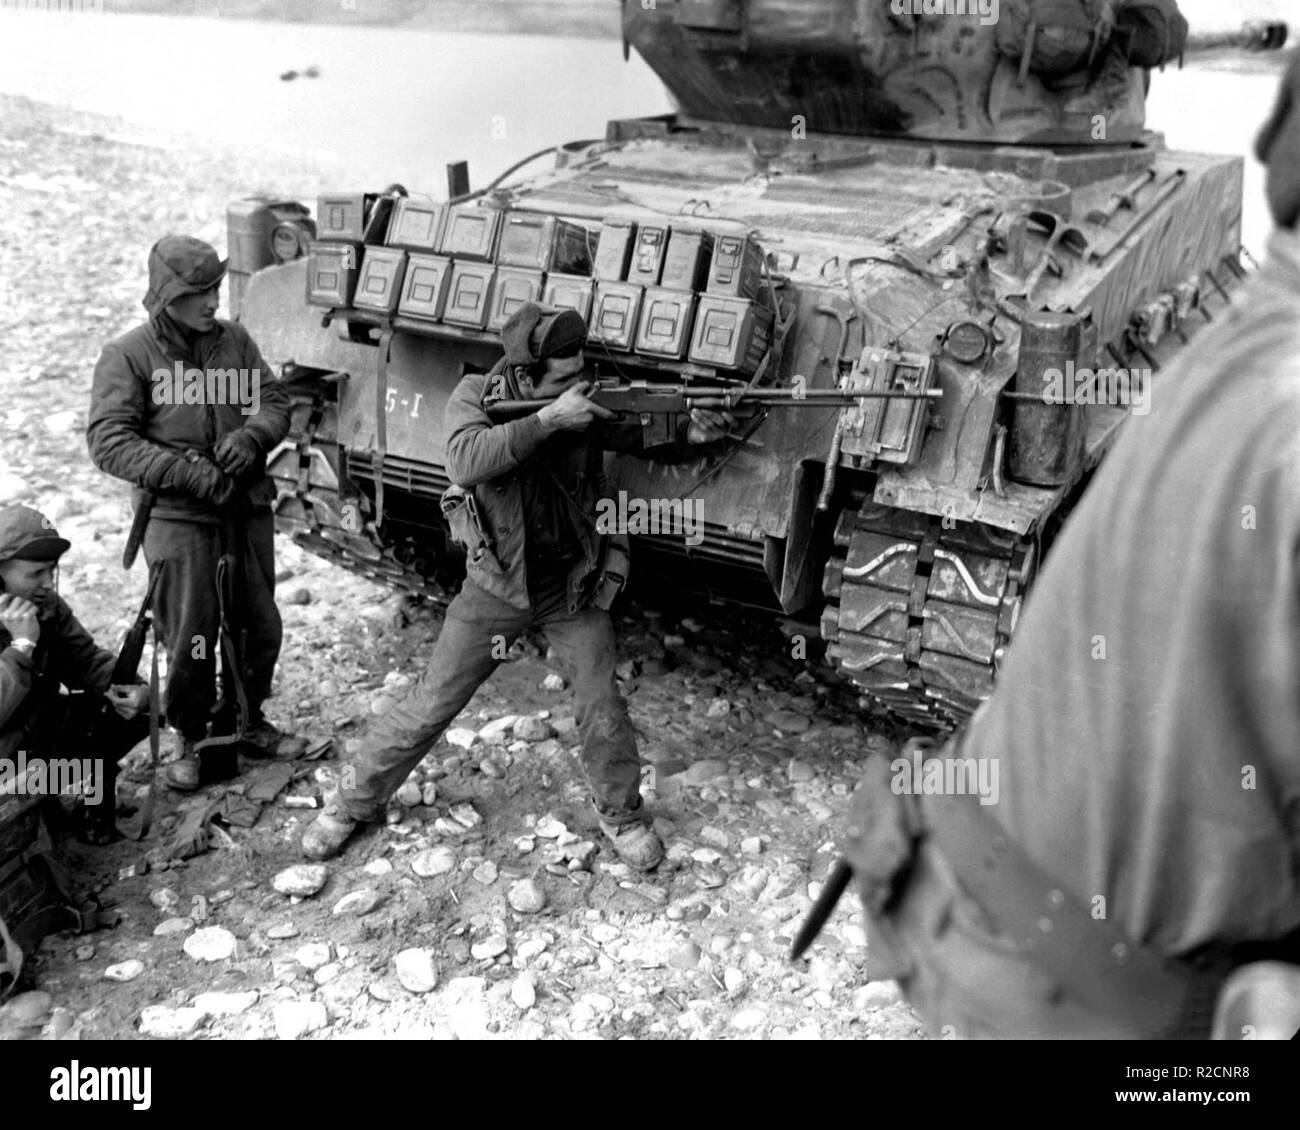 Korean War, 1951: A US soldier behind an M4A3E8 Sherman tank